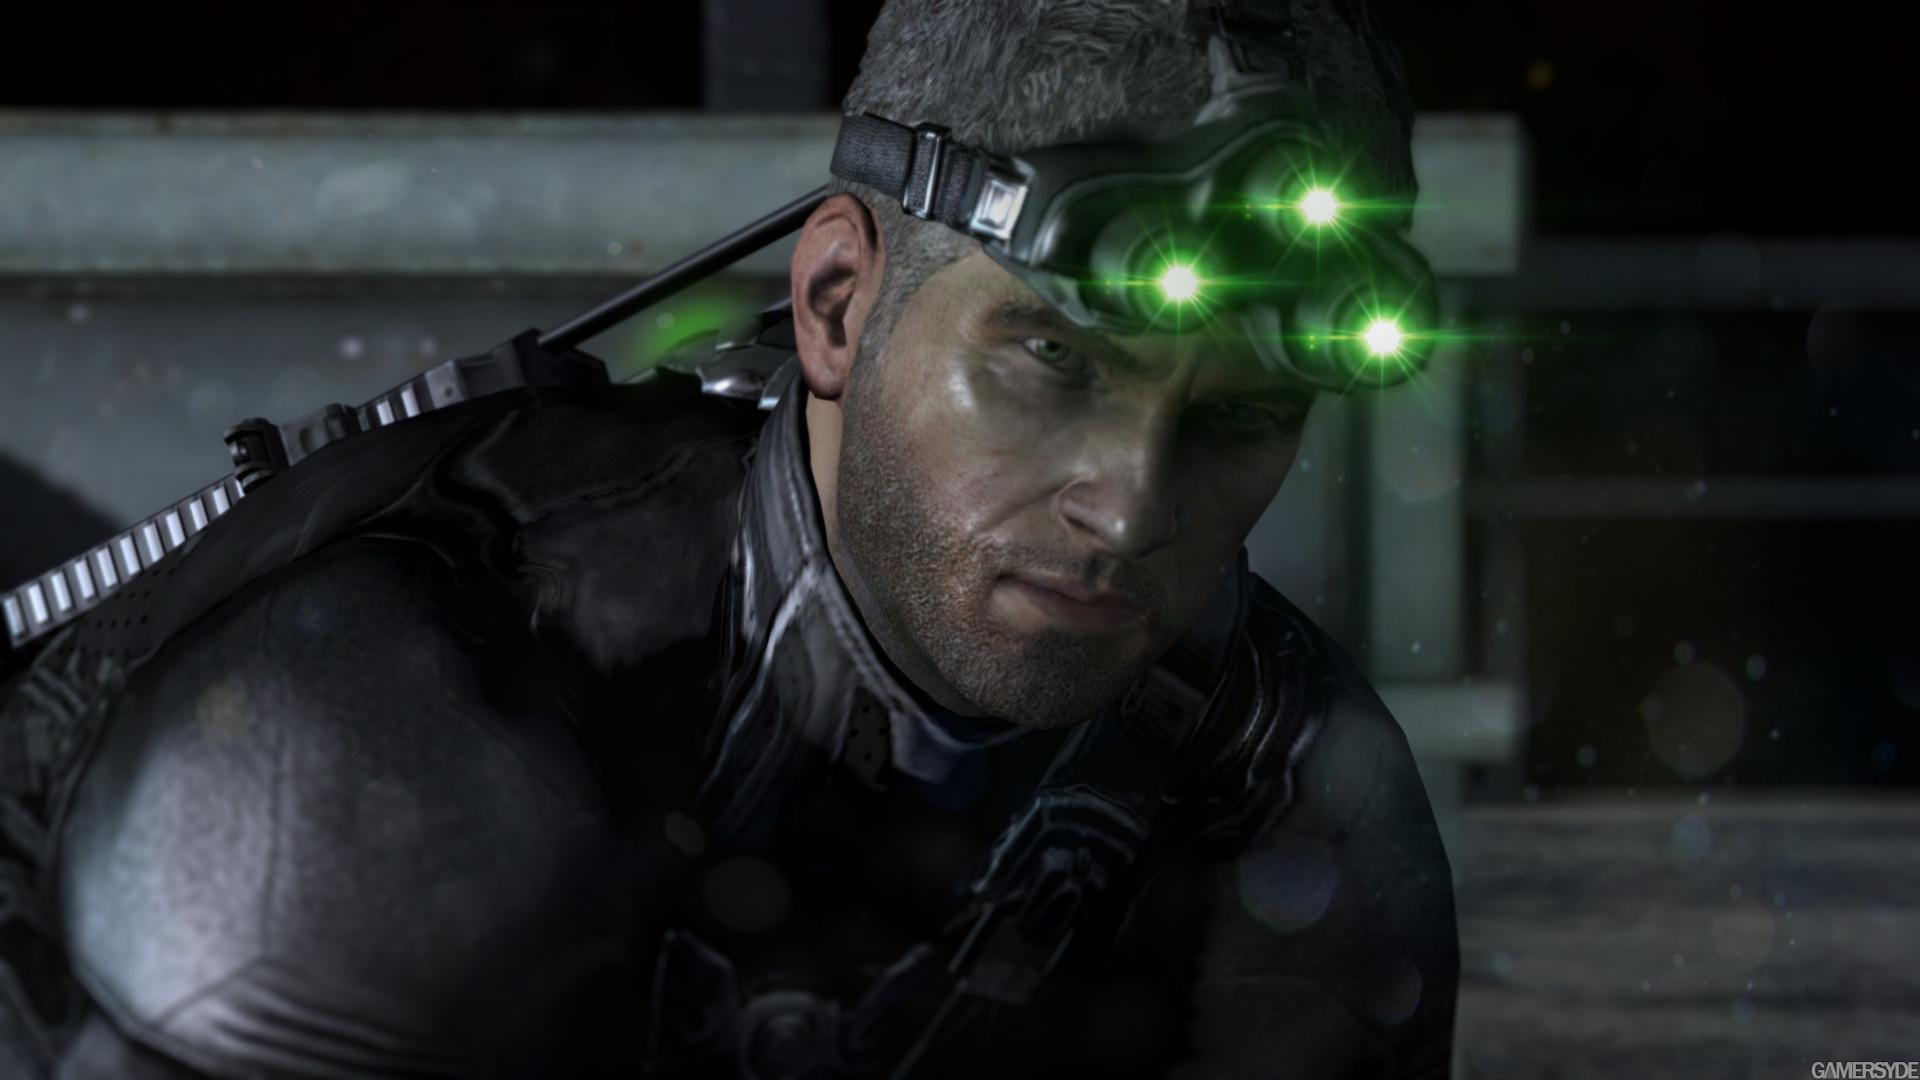 image tom clancy s splinter cell blacklist 22410 2521 0002 با تصاویر جدید Splinter Cell: Blacklist همراه باشید